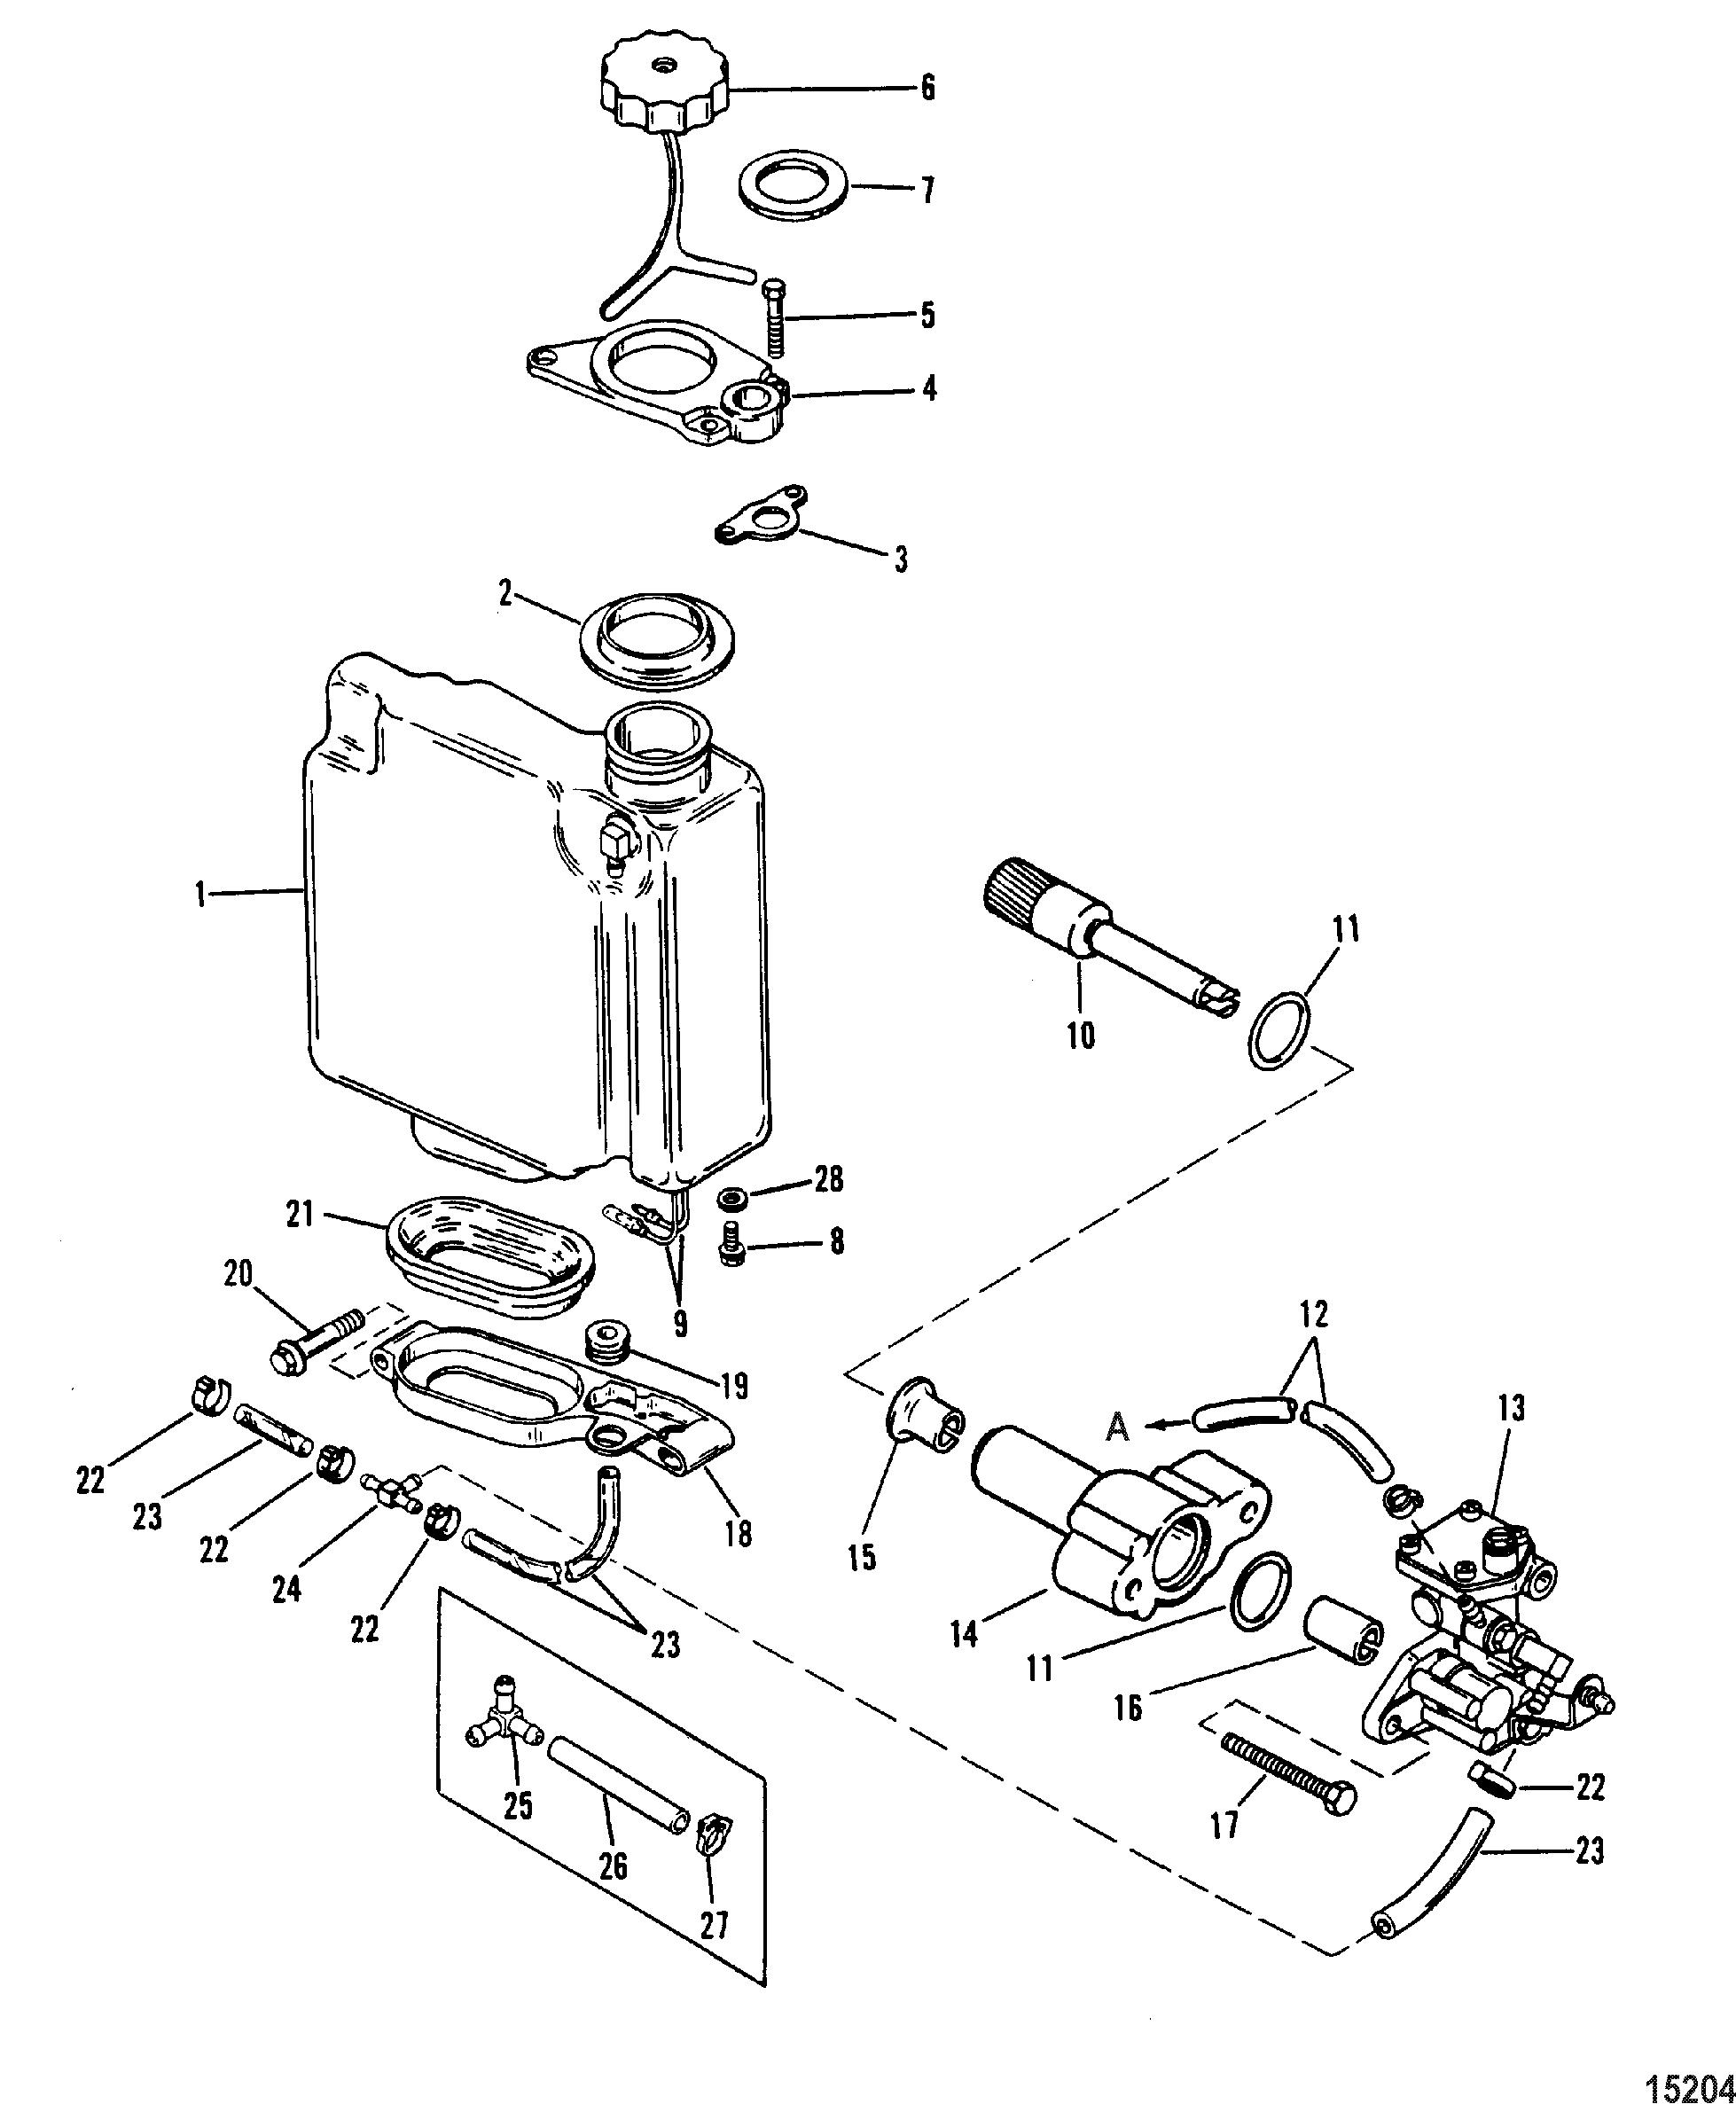 Faria Tach Wiring Detailed Schematics Diagram Marine Gauges 27 Images Yamaha Outboard Gauge